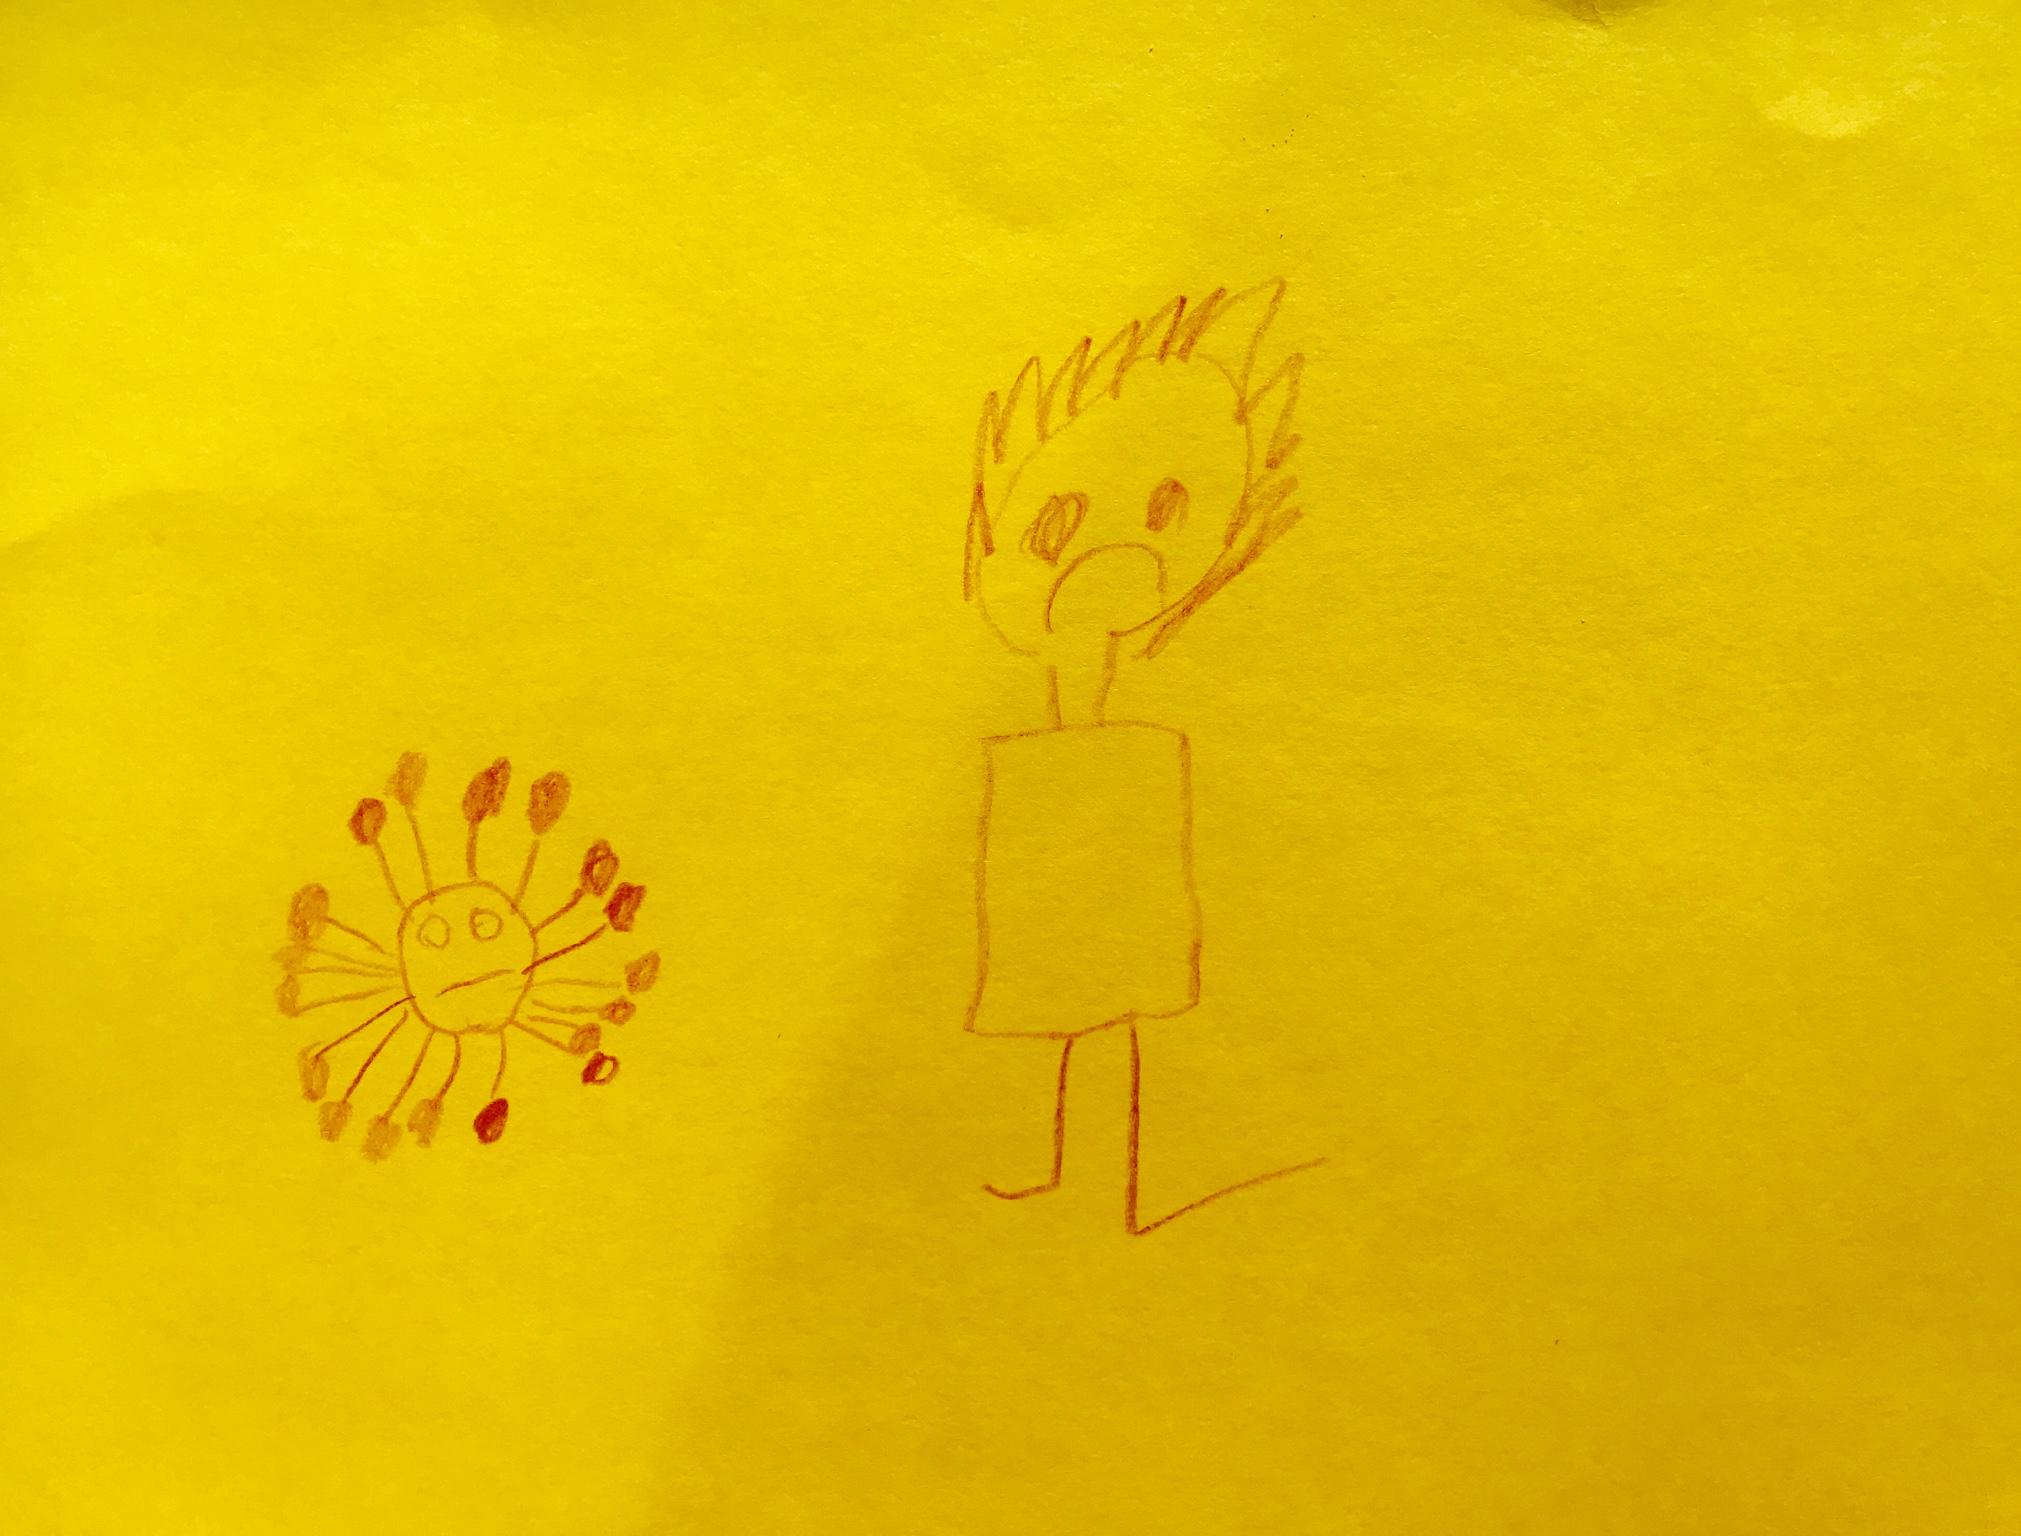 Age 6, Norway